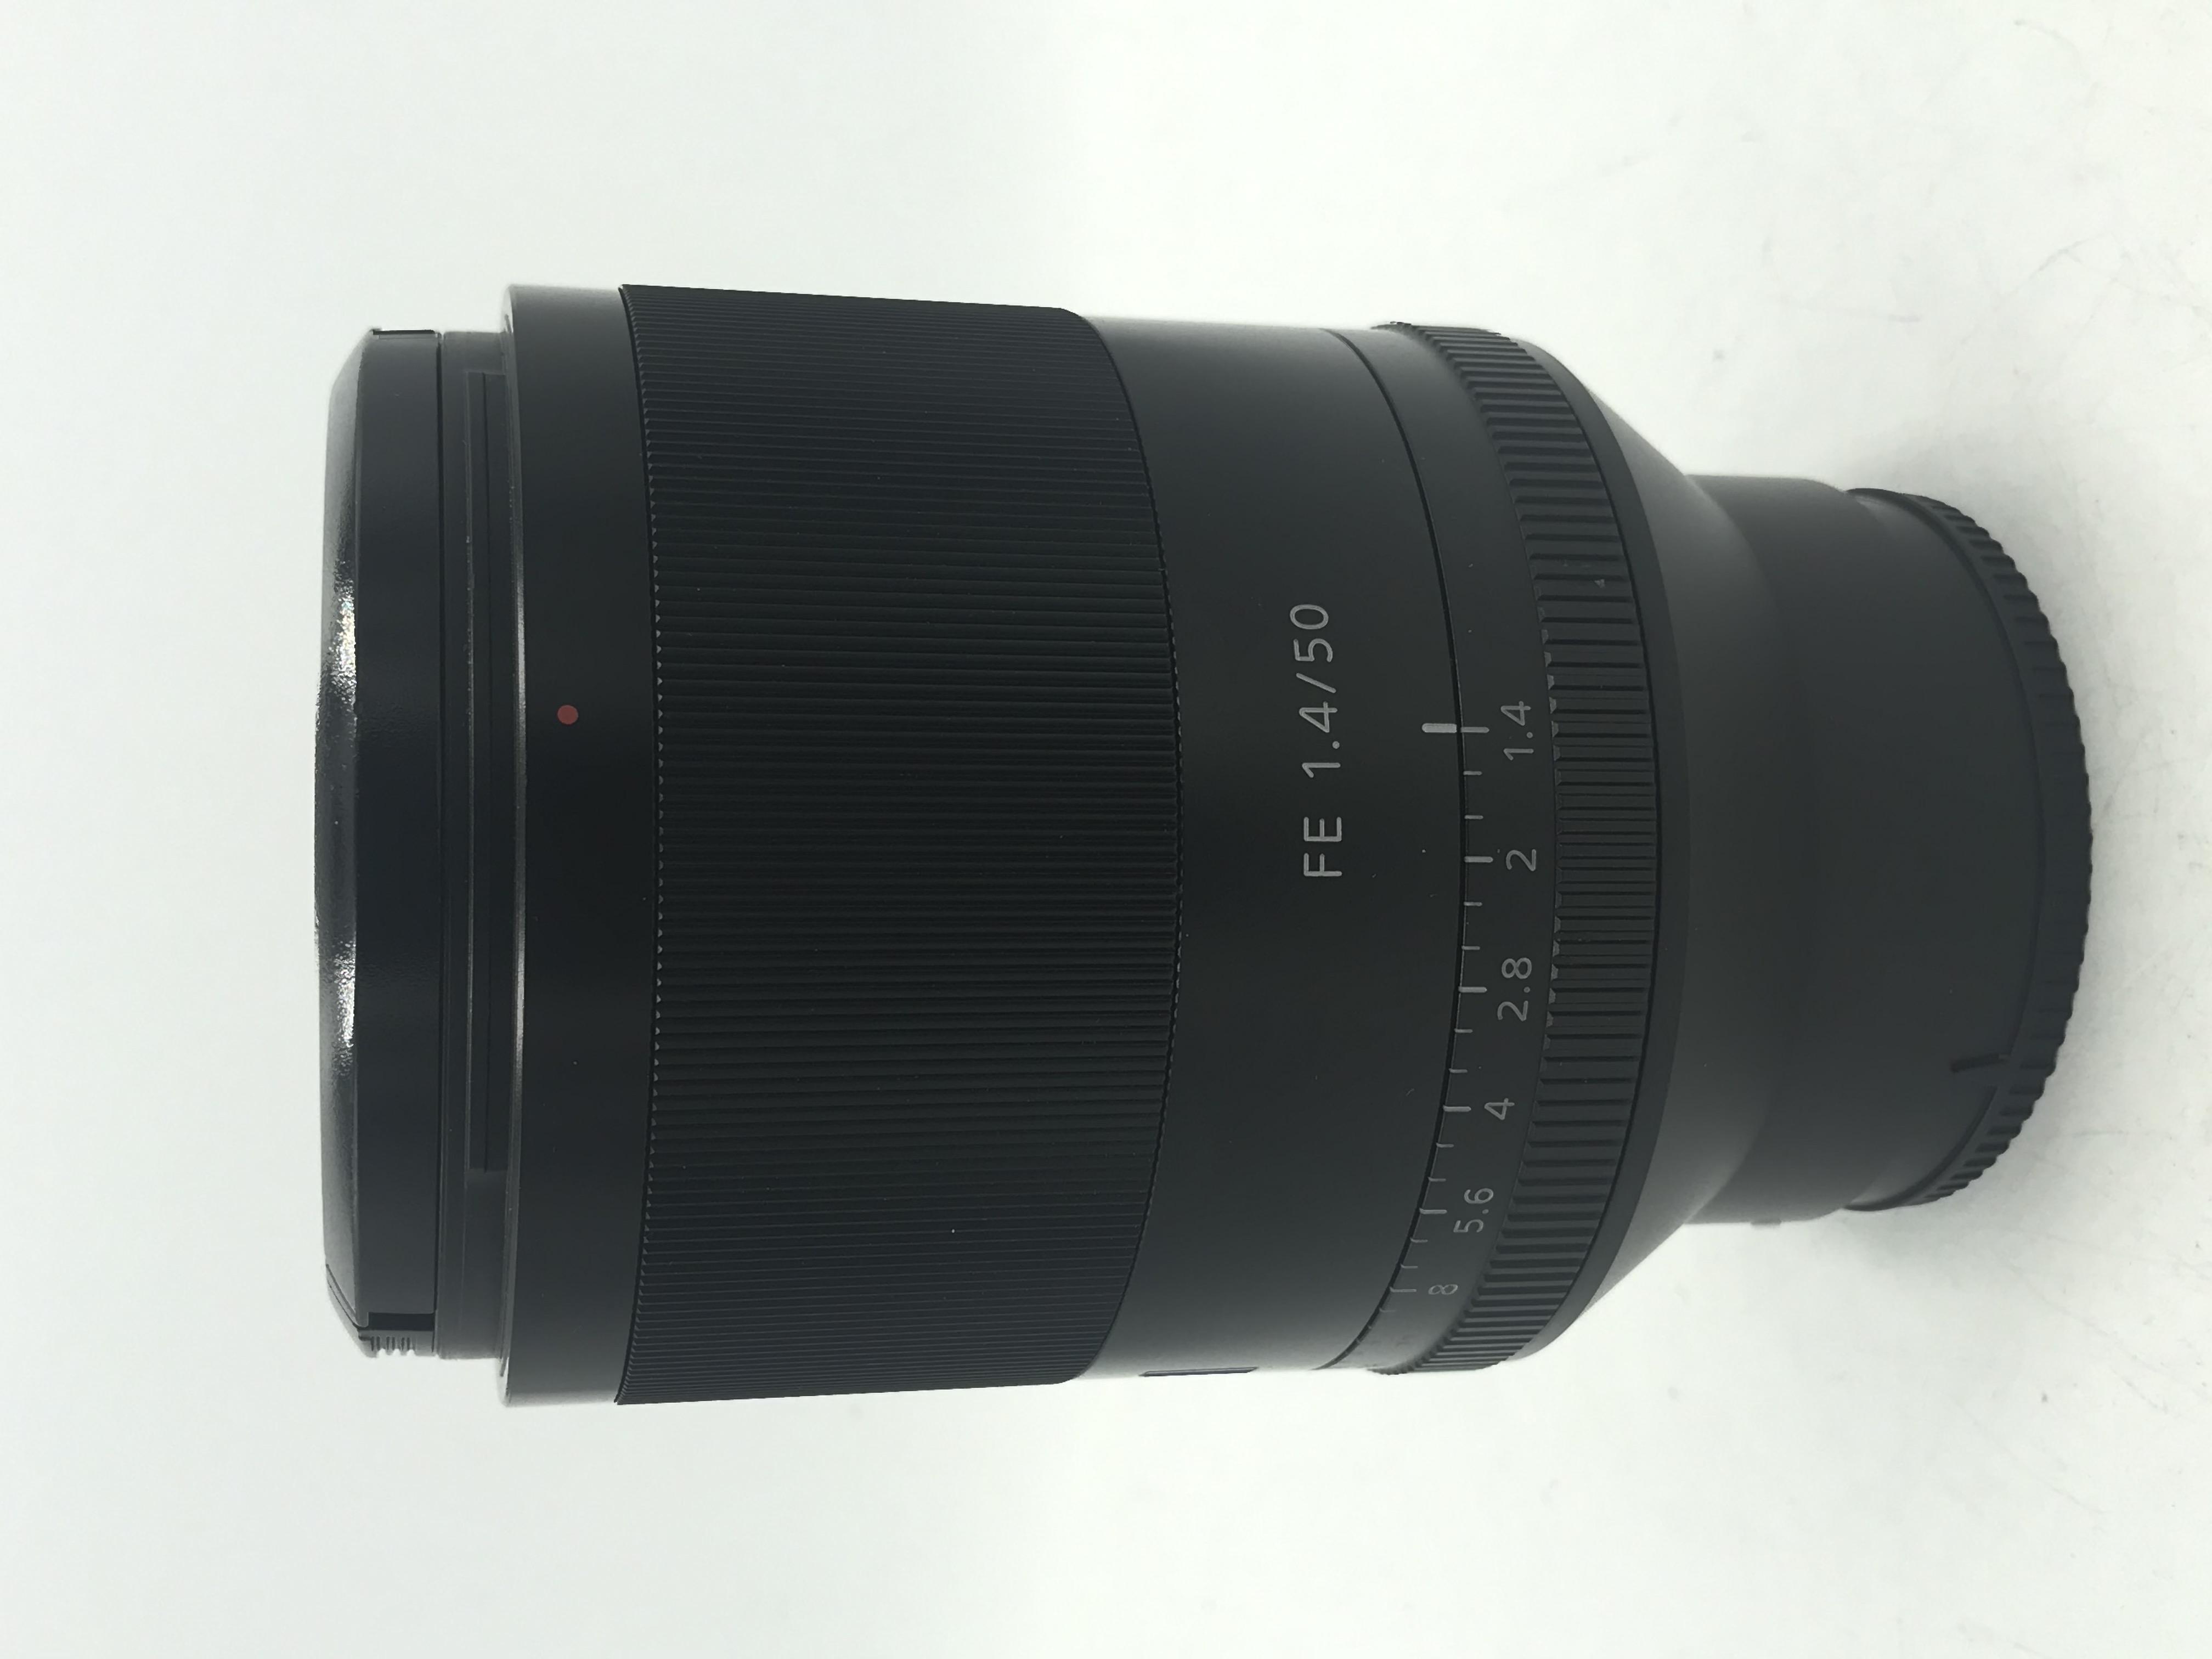 Used Sony 50mm F1.4 Planar T* FE Lens